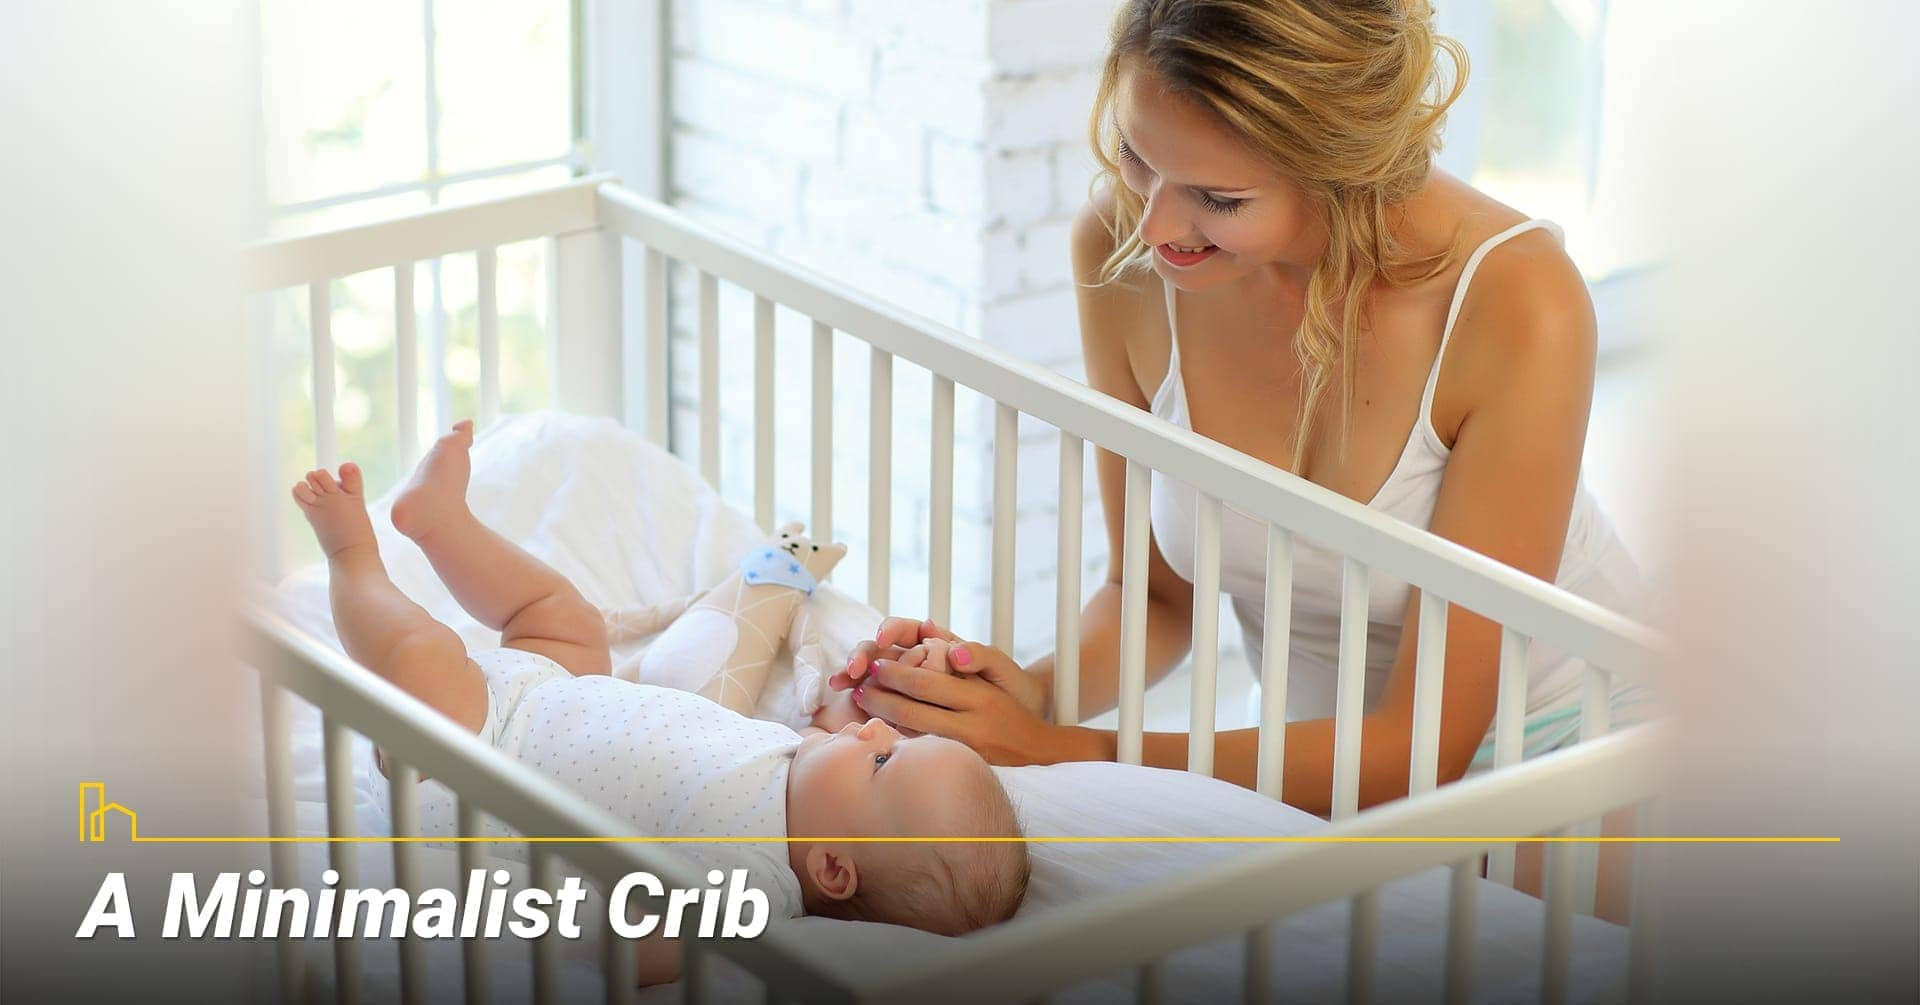 A Minimalist Crib, keep baby crib to the minimal